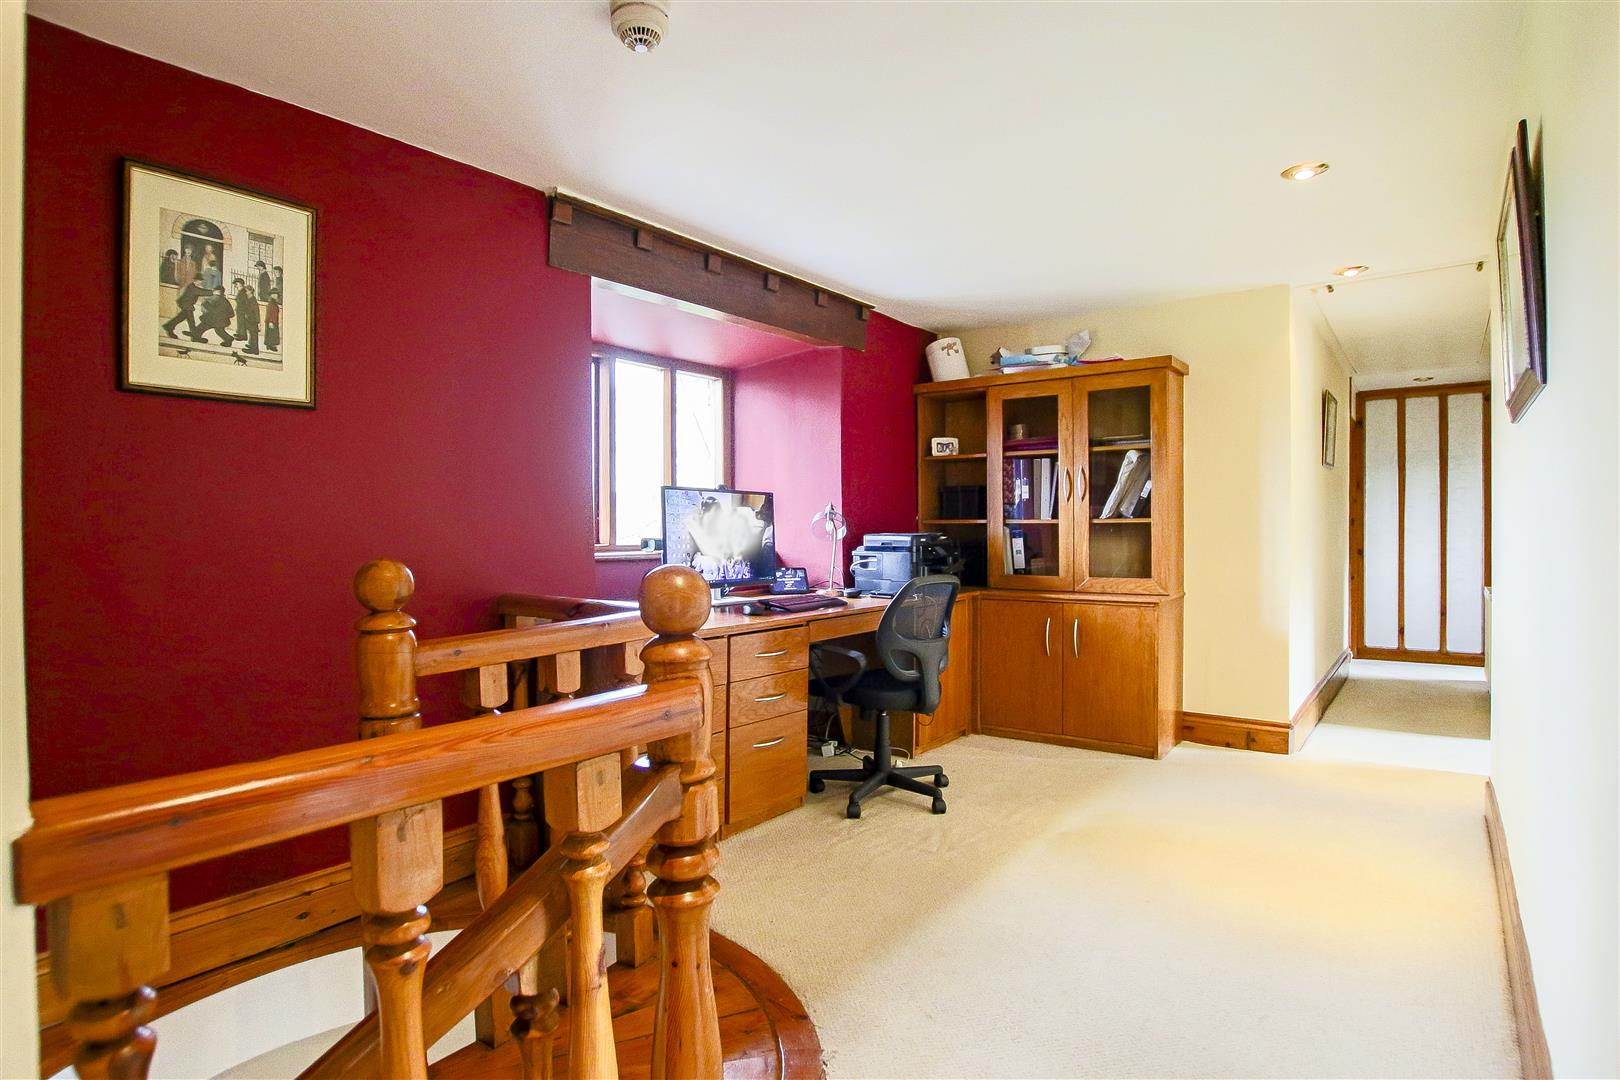 5 Bedroom Barn Conversion For Sale - 5.jpg